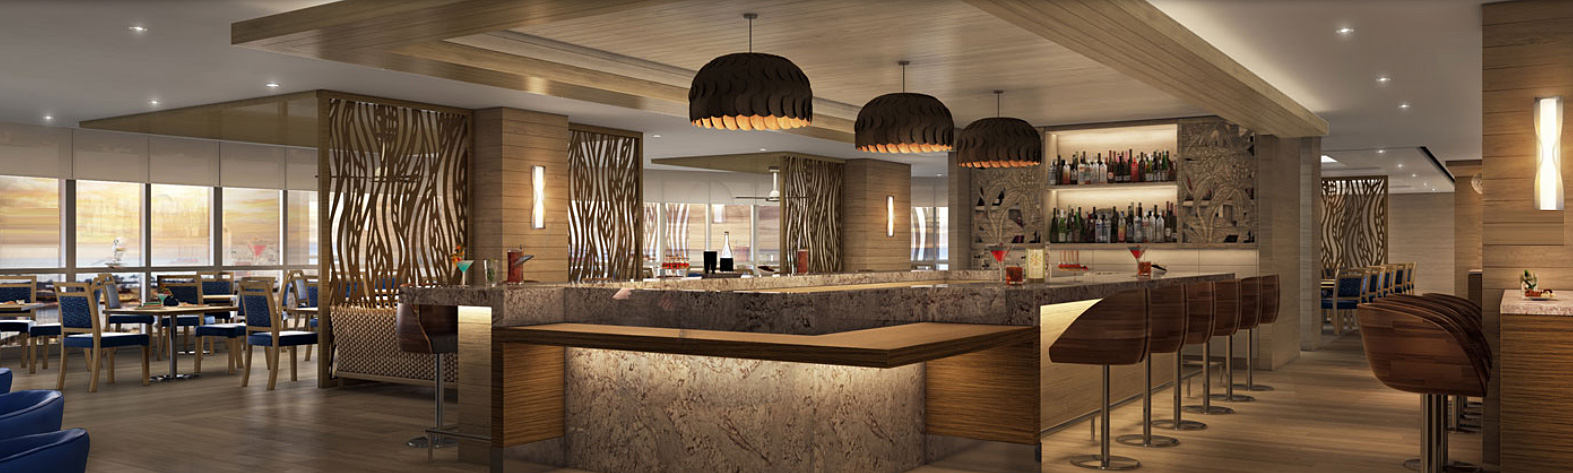 Prince court reopens as 100 sails restaurant bar tasty for 100 floors 3rd floor